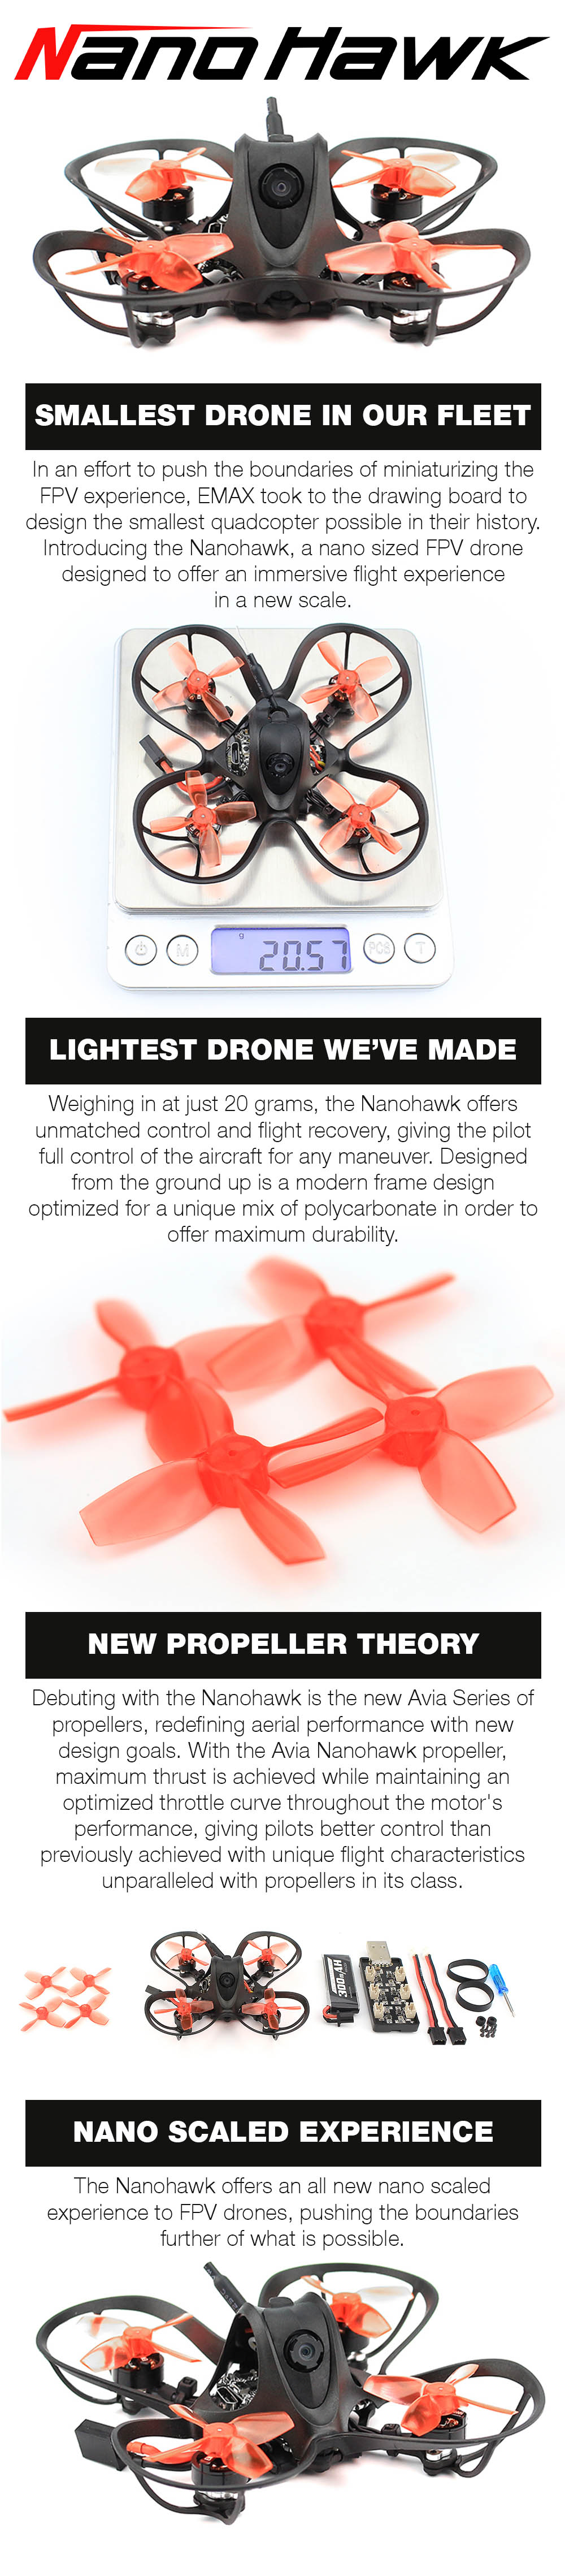 Nanohawk_Infographic_English_.jpg